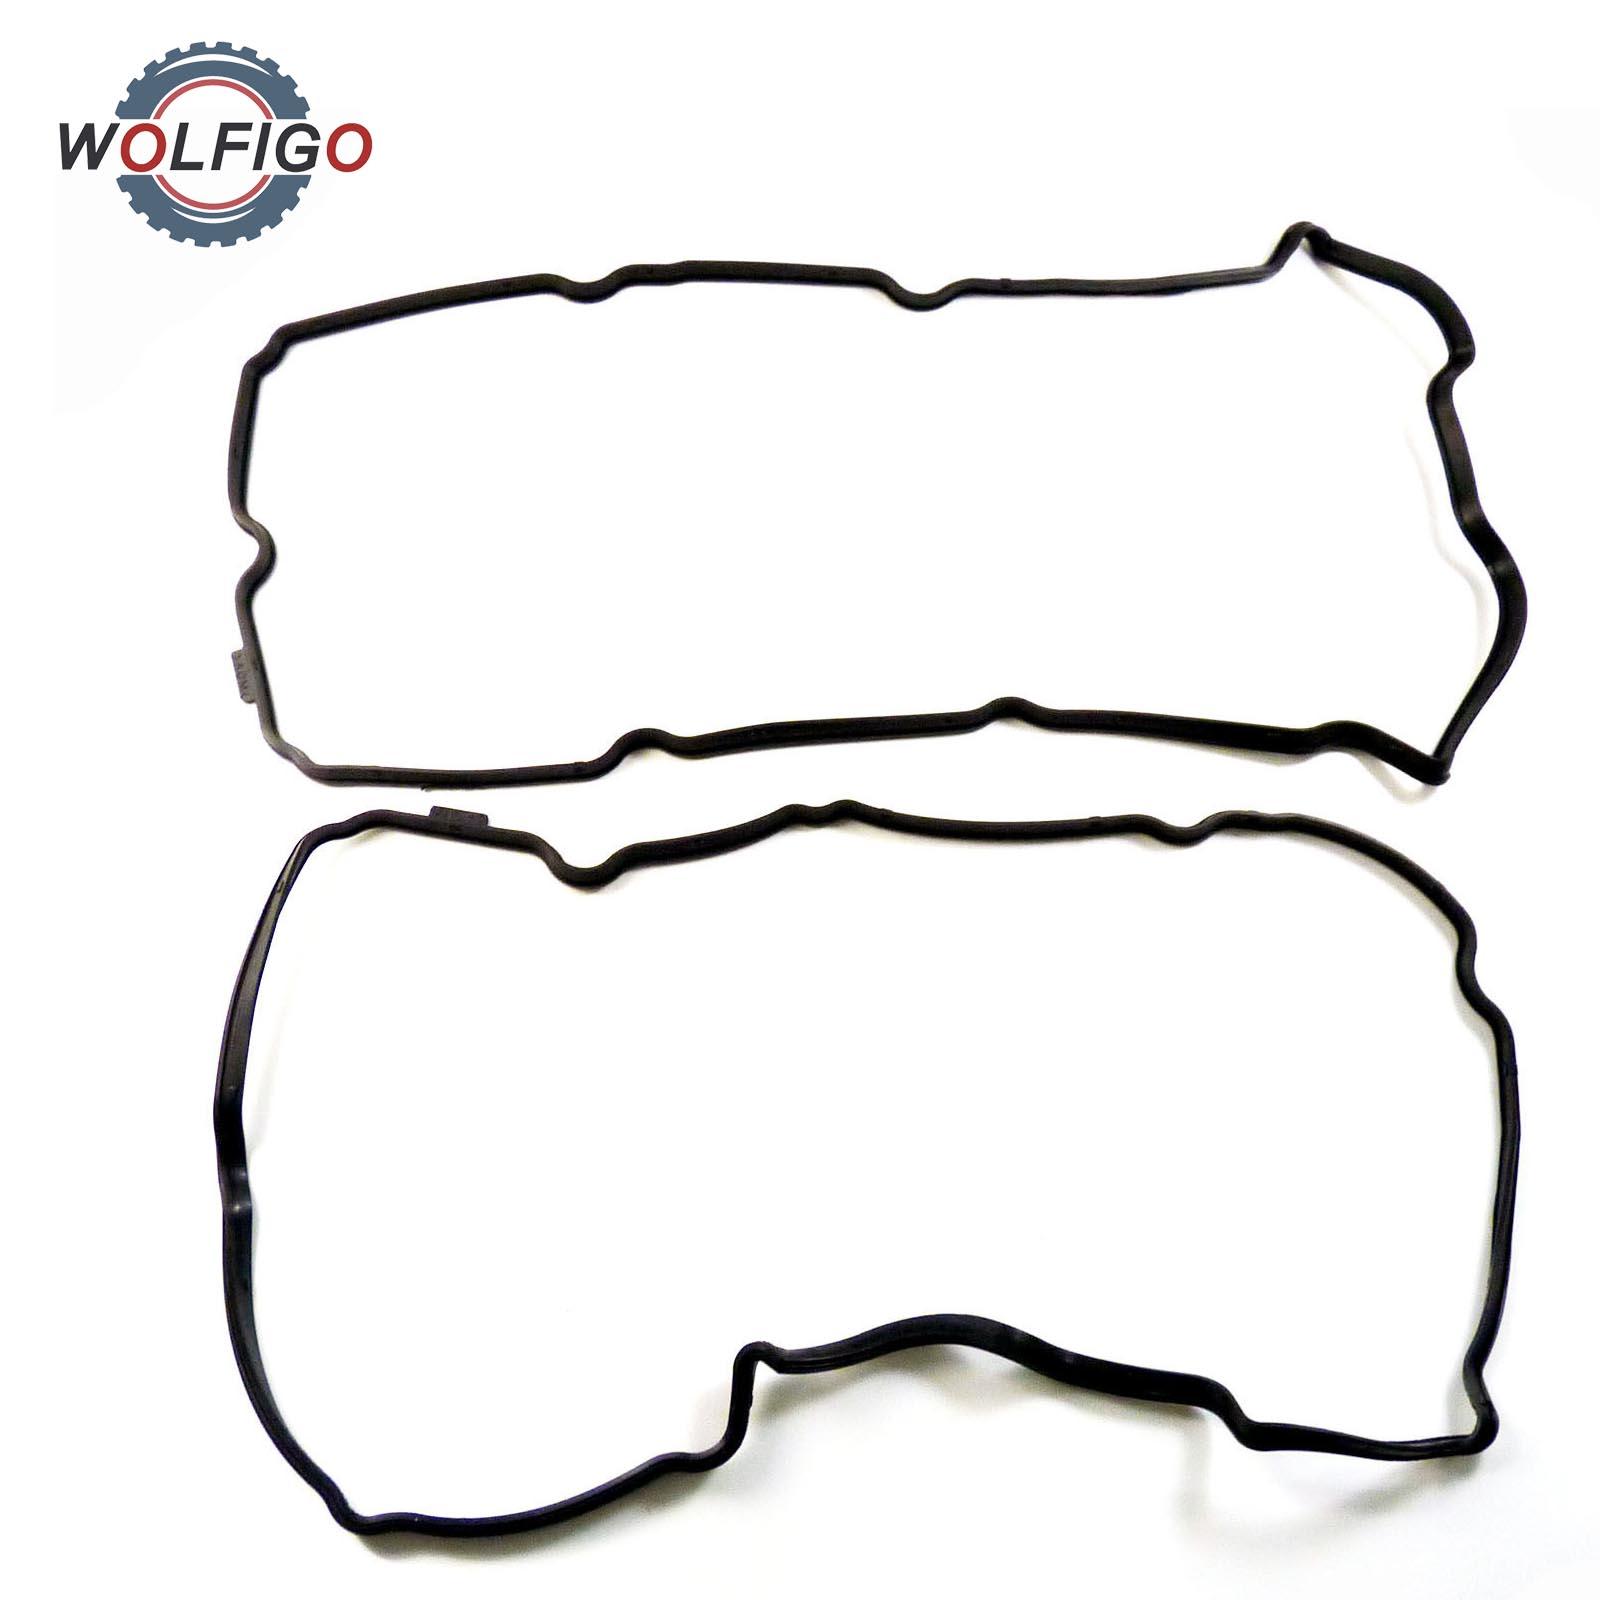 Wolfigo 2pcs Cylinder Valve Cover Gasket Set